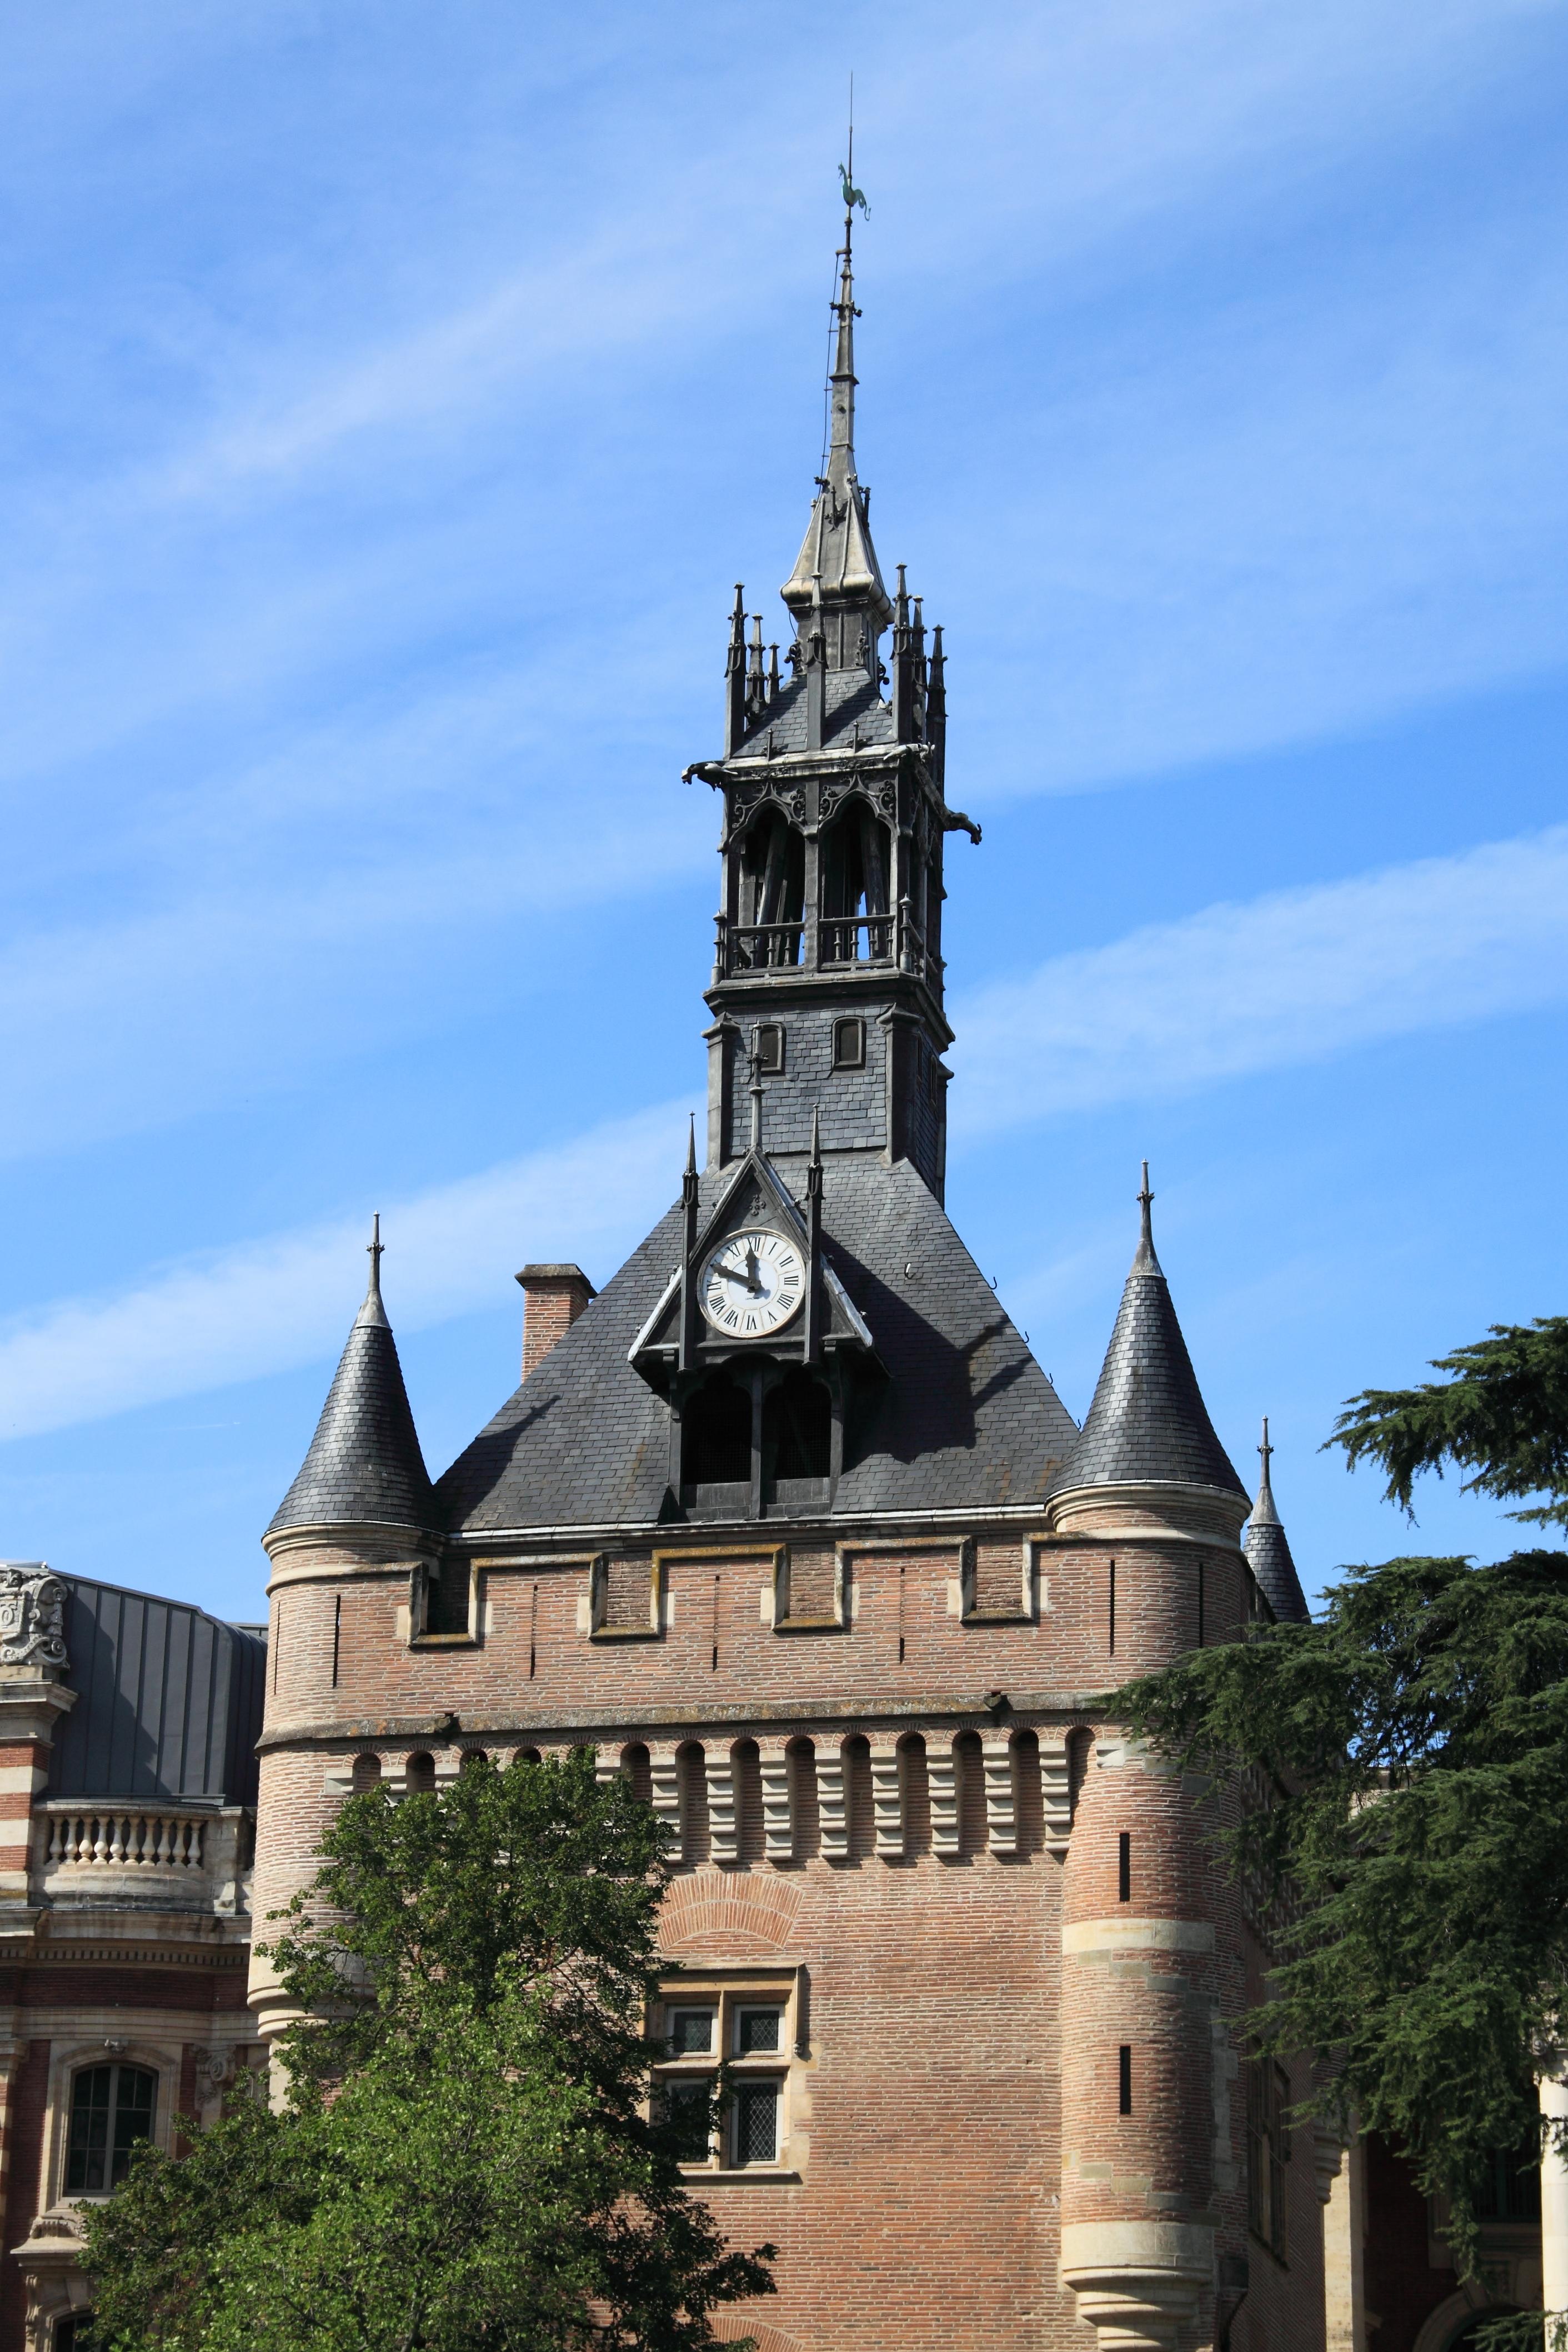 File:Donjon du Capitole de Toulouse, verticale.JPG - Wikimedia Commons